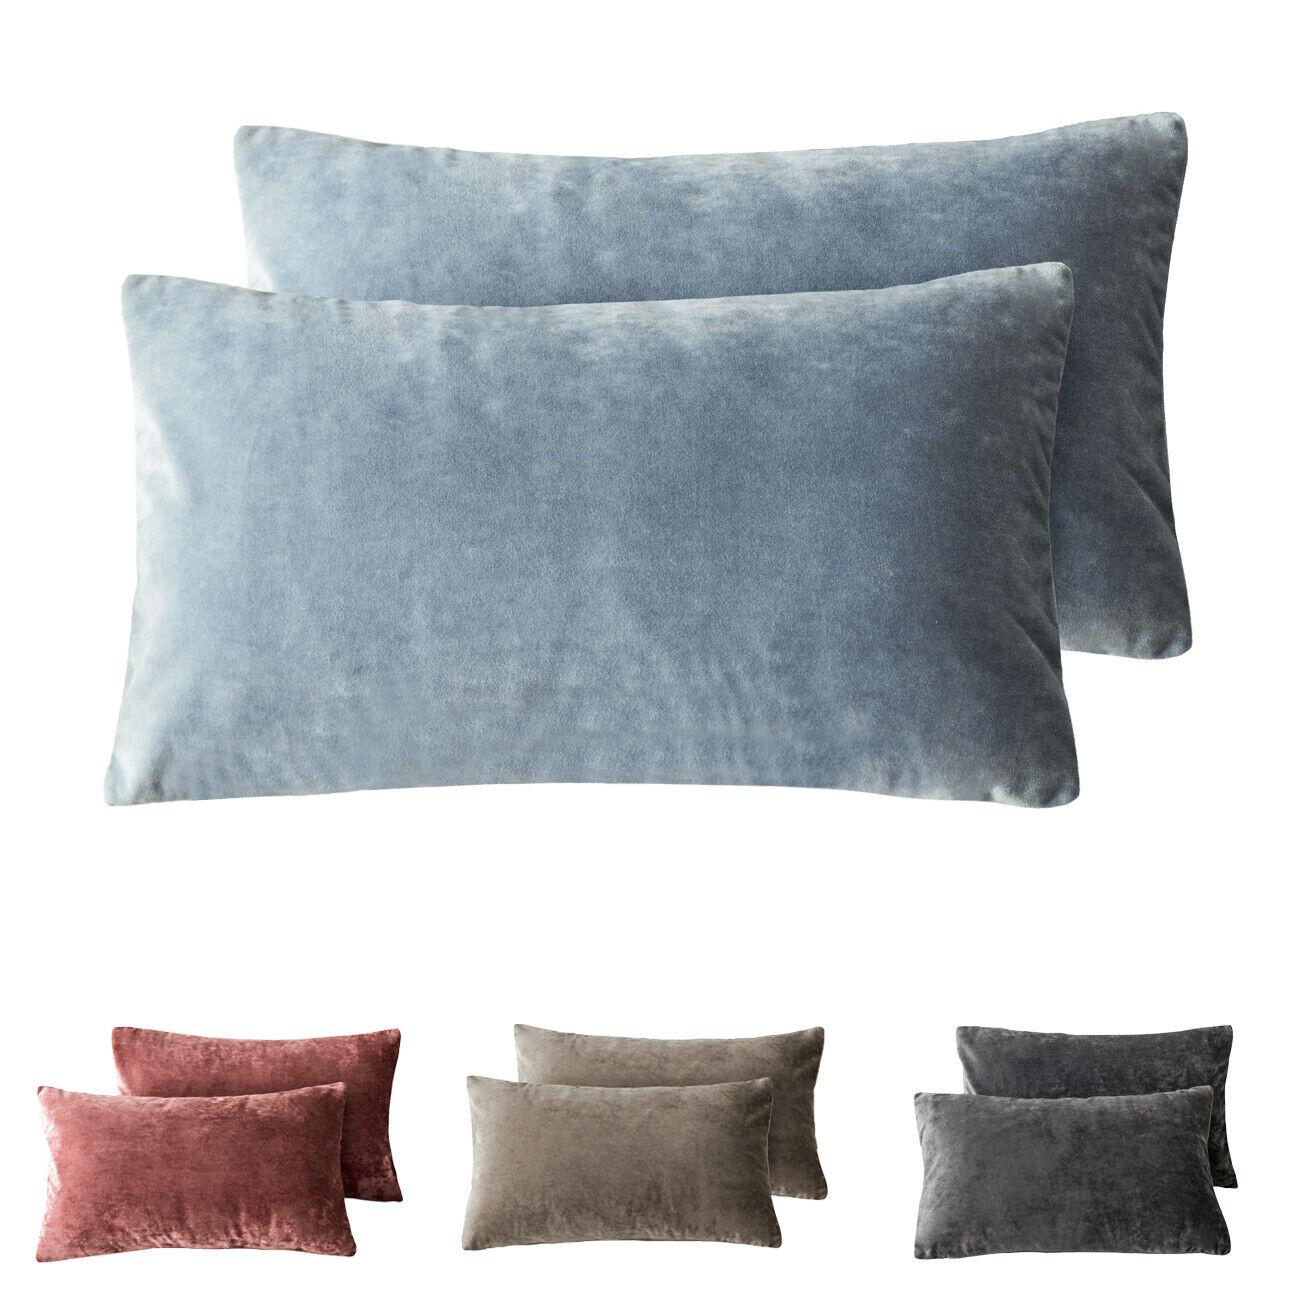 Velvet Throw Pillow Covers Rectangle Lumbar Decor Soft Warm